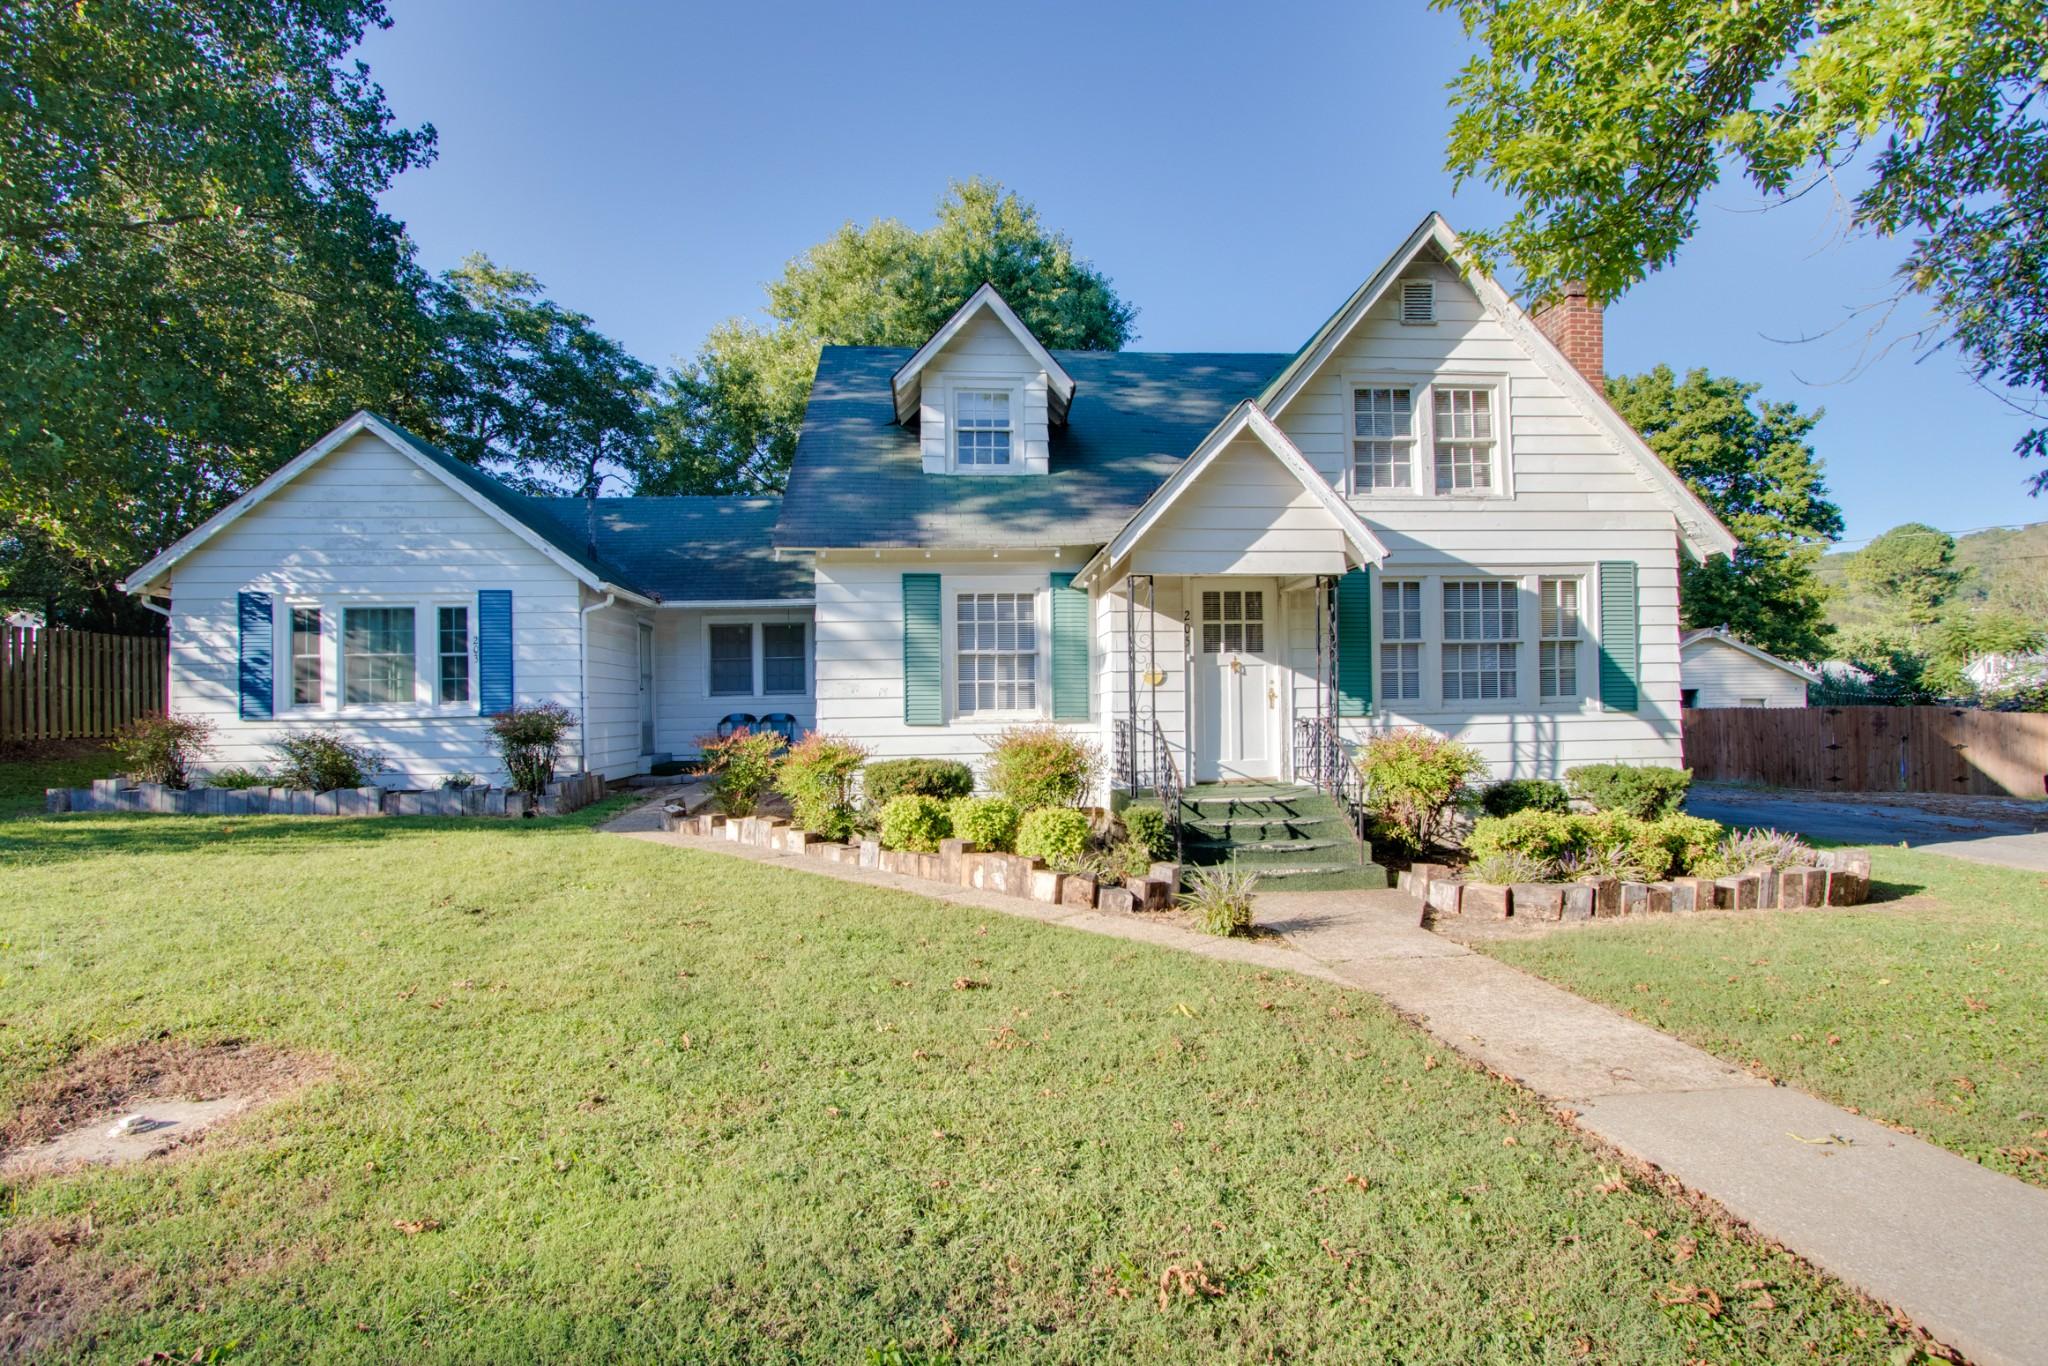 205 Jackson Ave Property Photo - Carthage, TN real estate listing